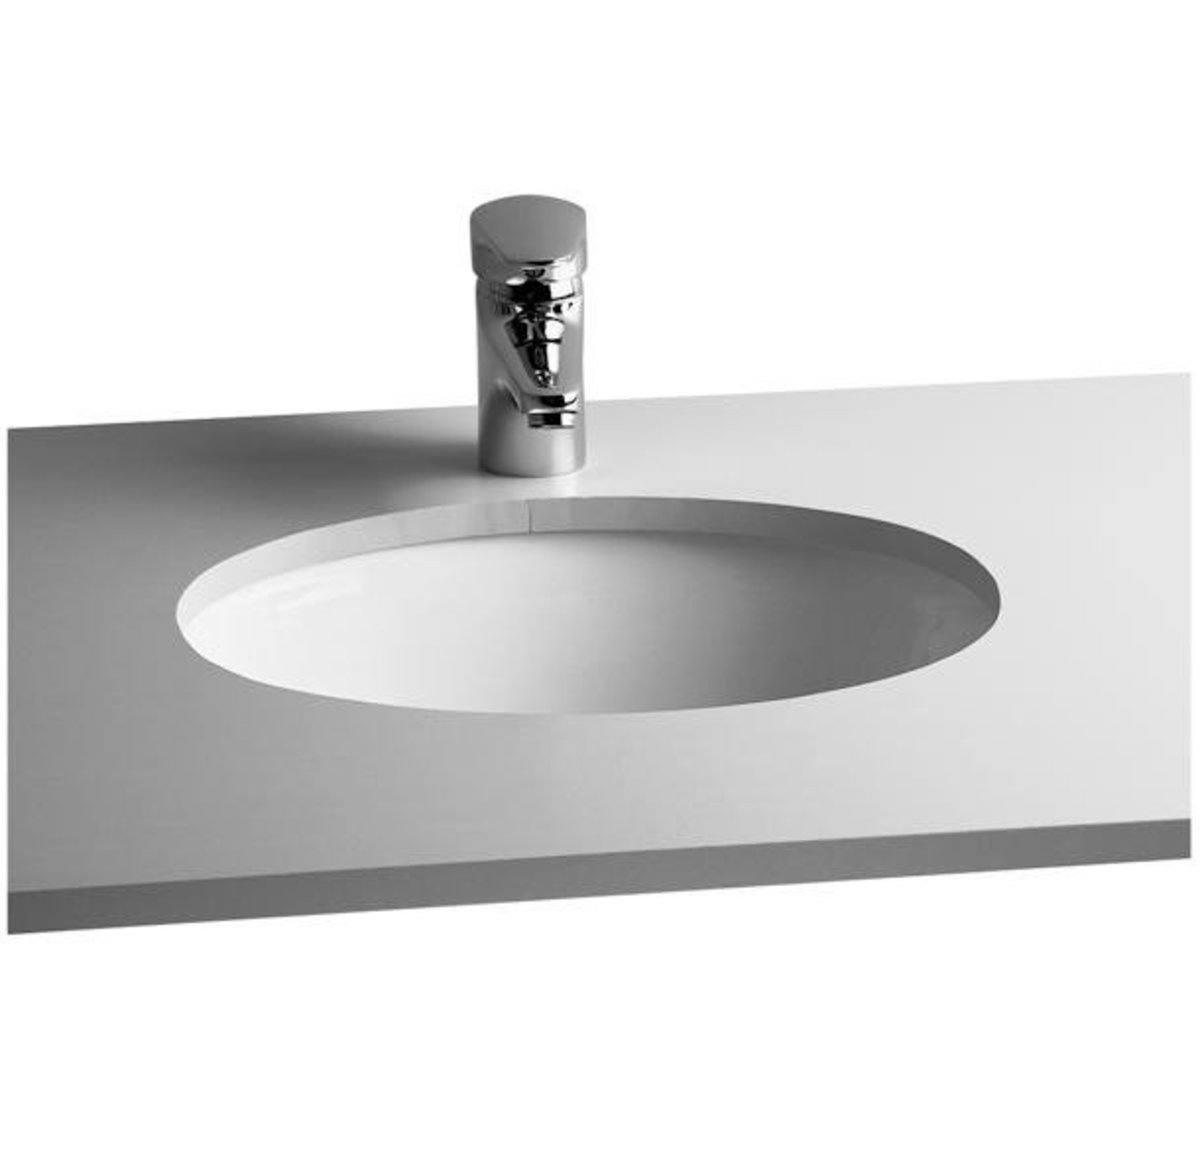 S20 BATHROOM UNDERCOUNTER BASIN 42 CM - WHITEDIMENSION : 470 X 380 X 190 MM